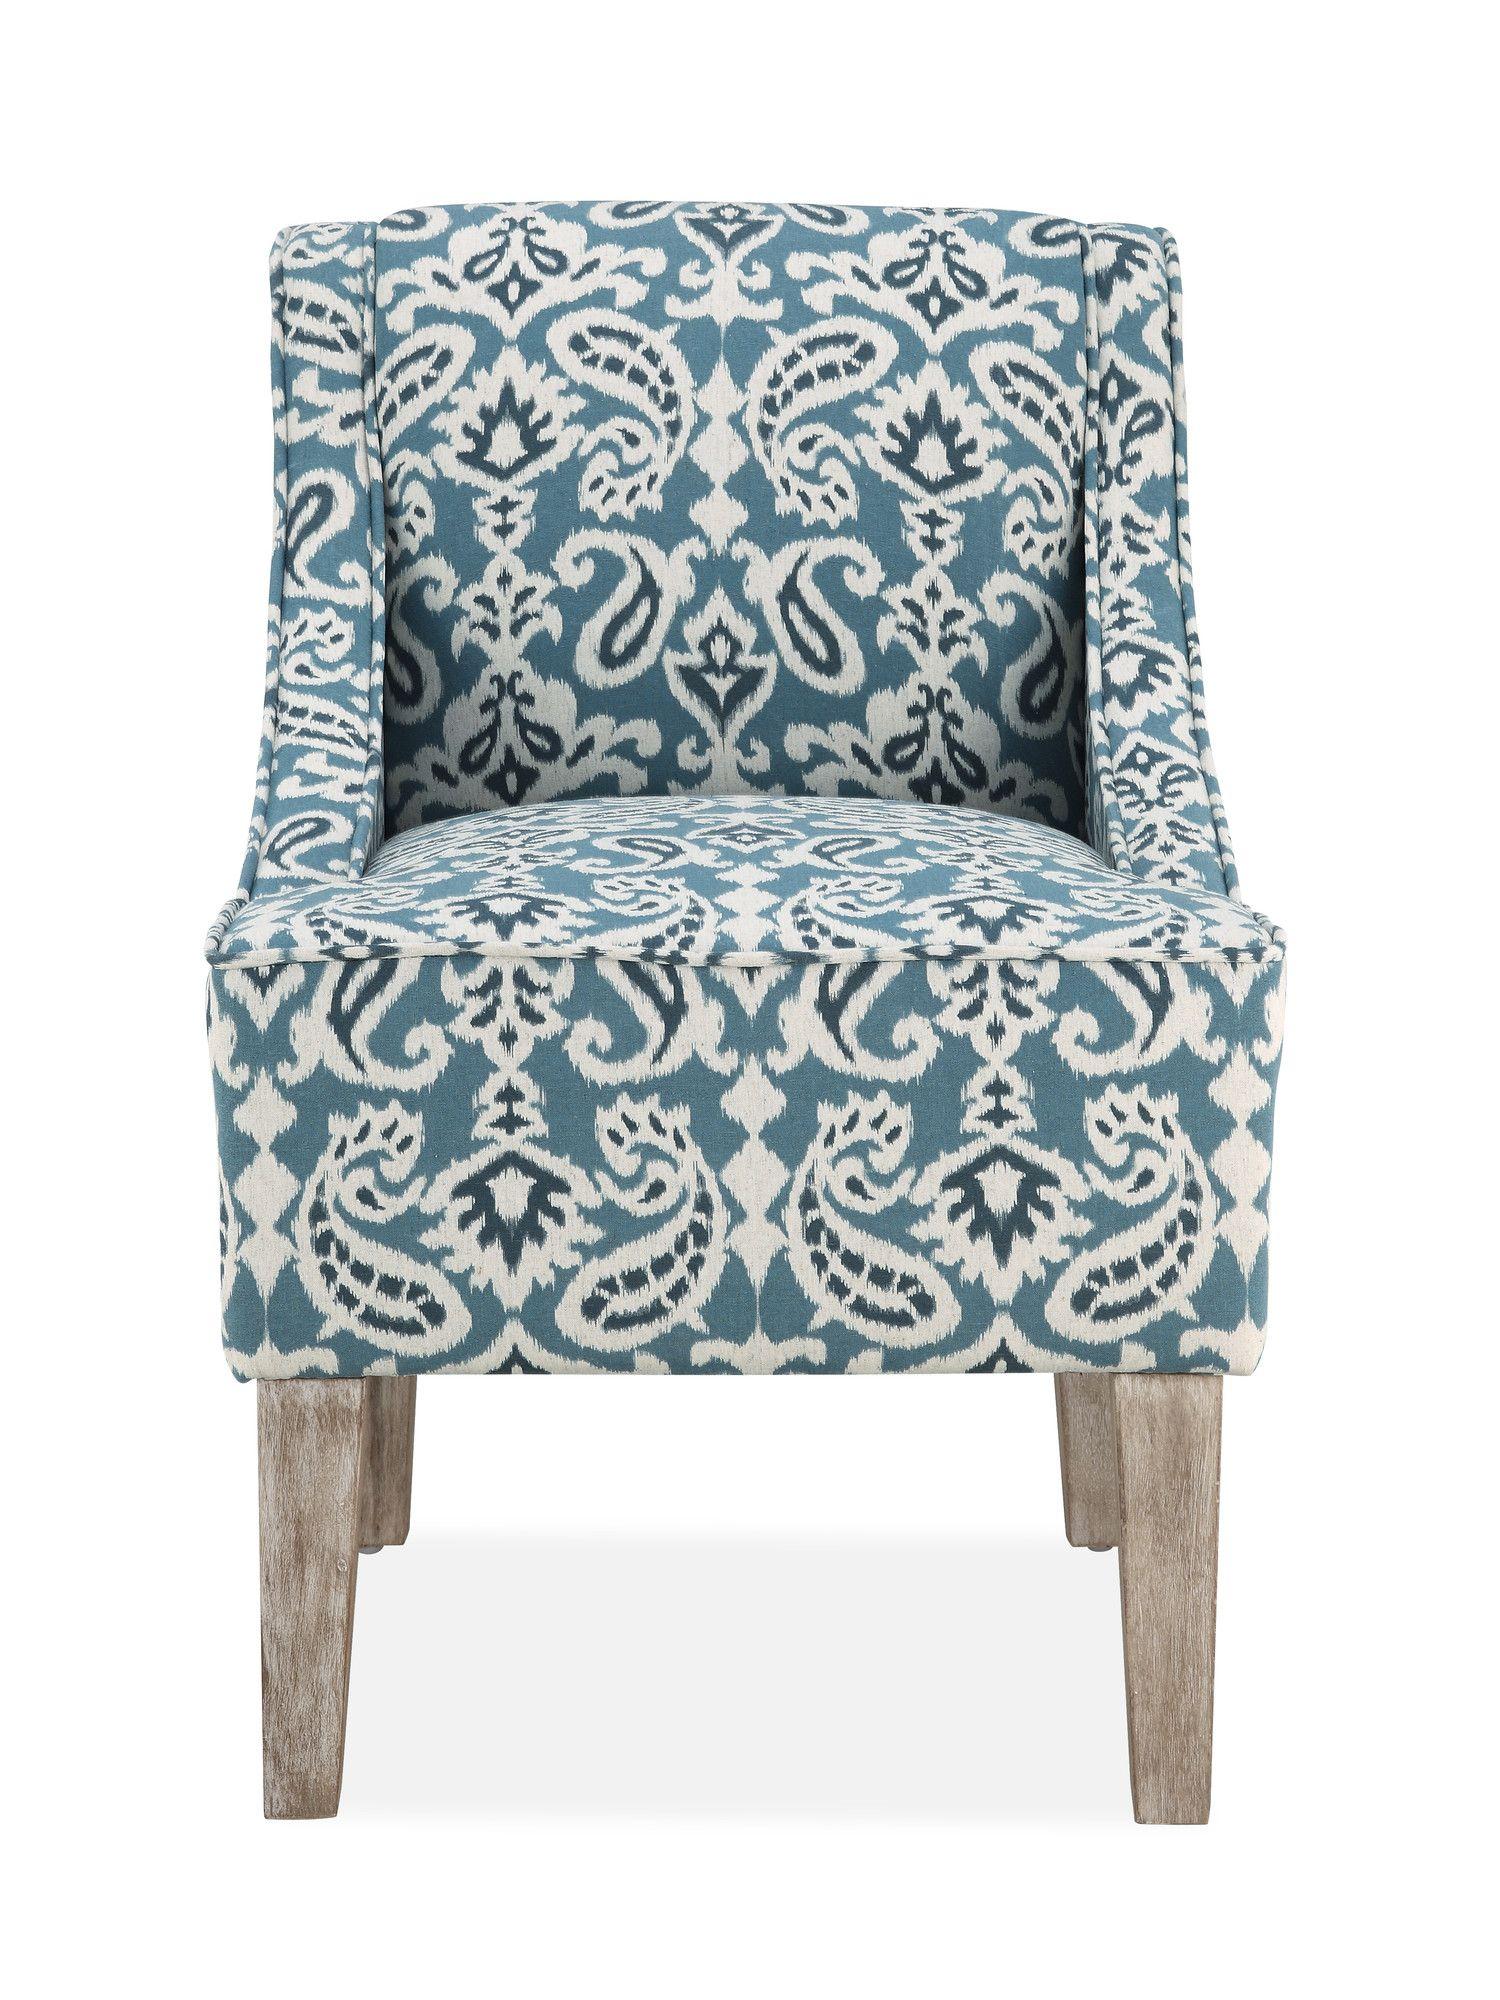 Best Prescott Slipper Chair In Teal Ii Wayfair Accent 400 x 300